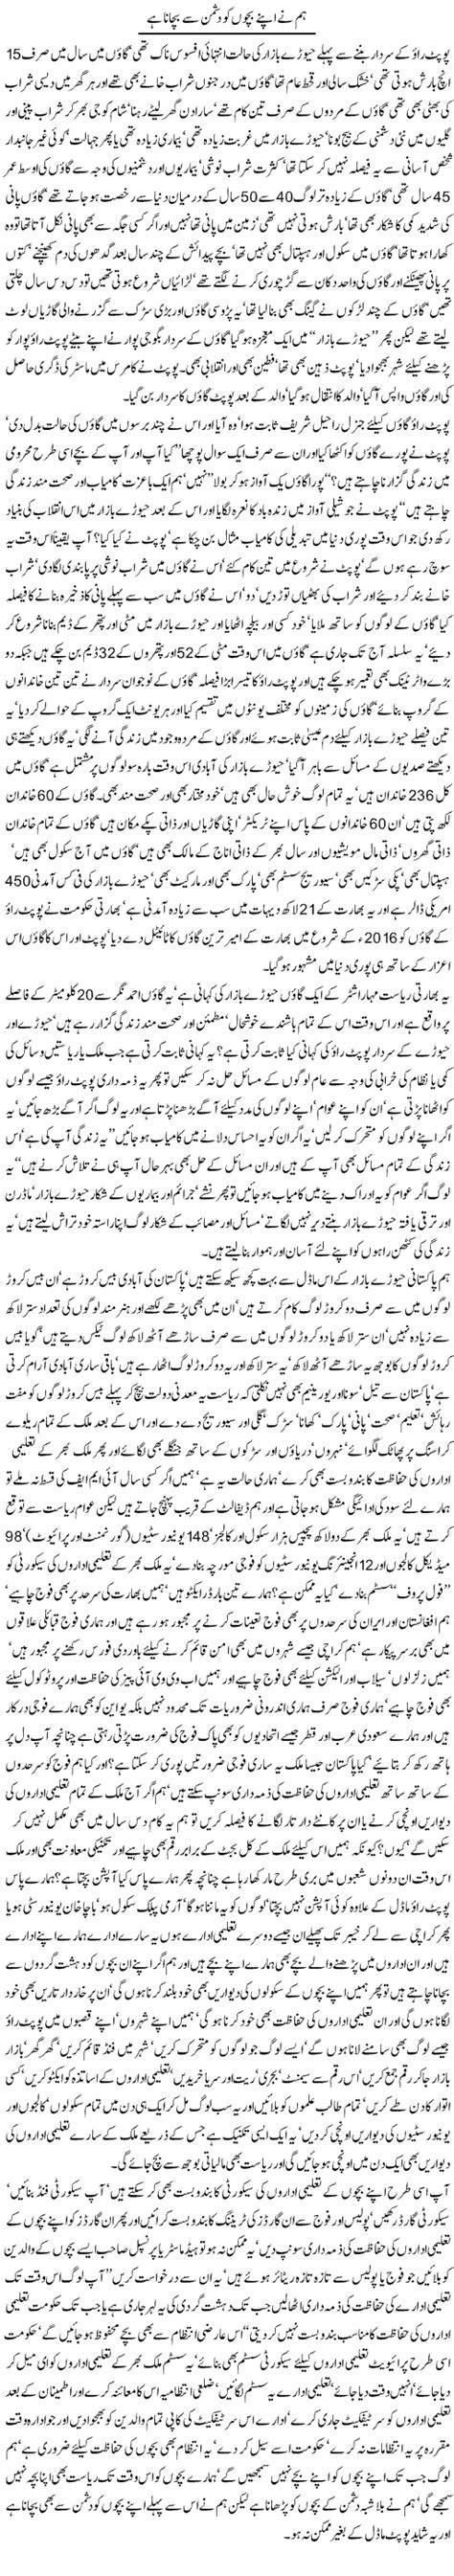 Hum Ne Apnay Bachon Ko Dushman Sy Bachana Hai By Javed Chaudhry  Express News Urdu Columns